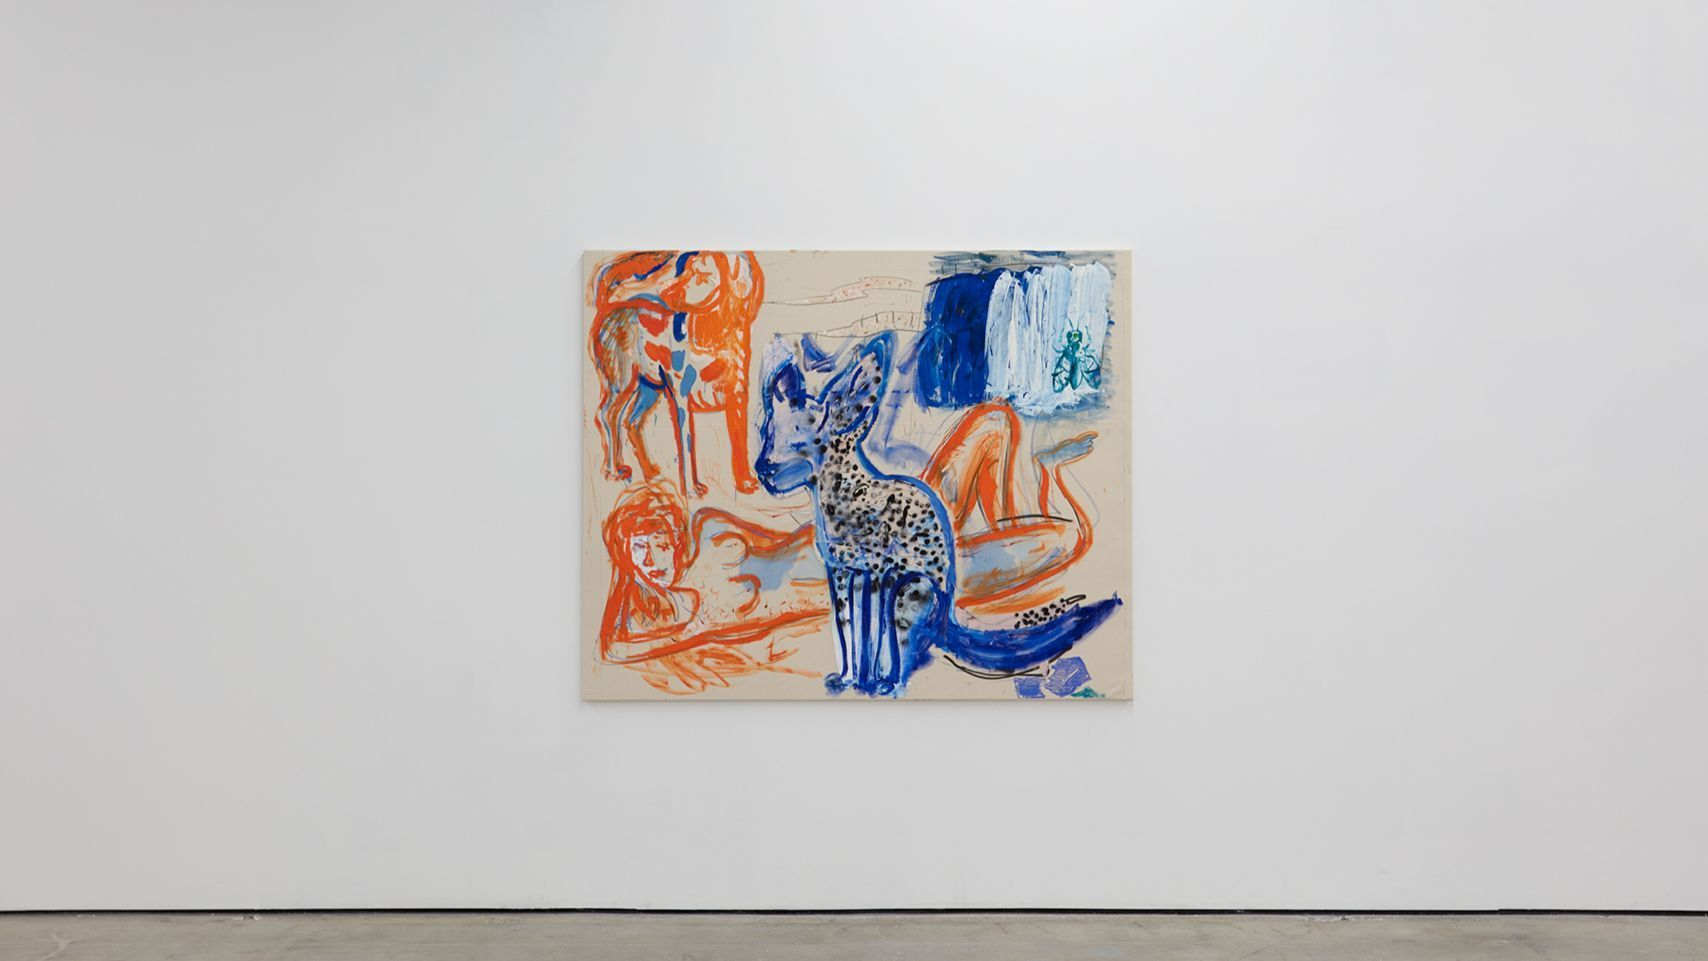 """Skills,"" 2017, by Razvan Boar, at Nicodim Gallery."